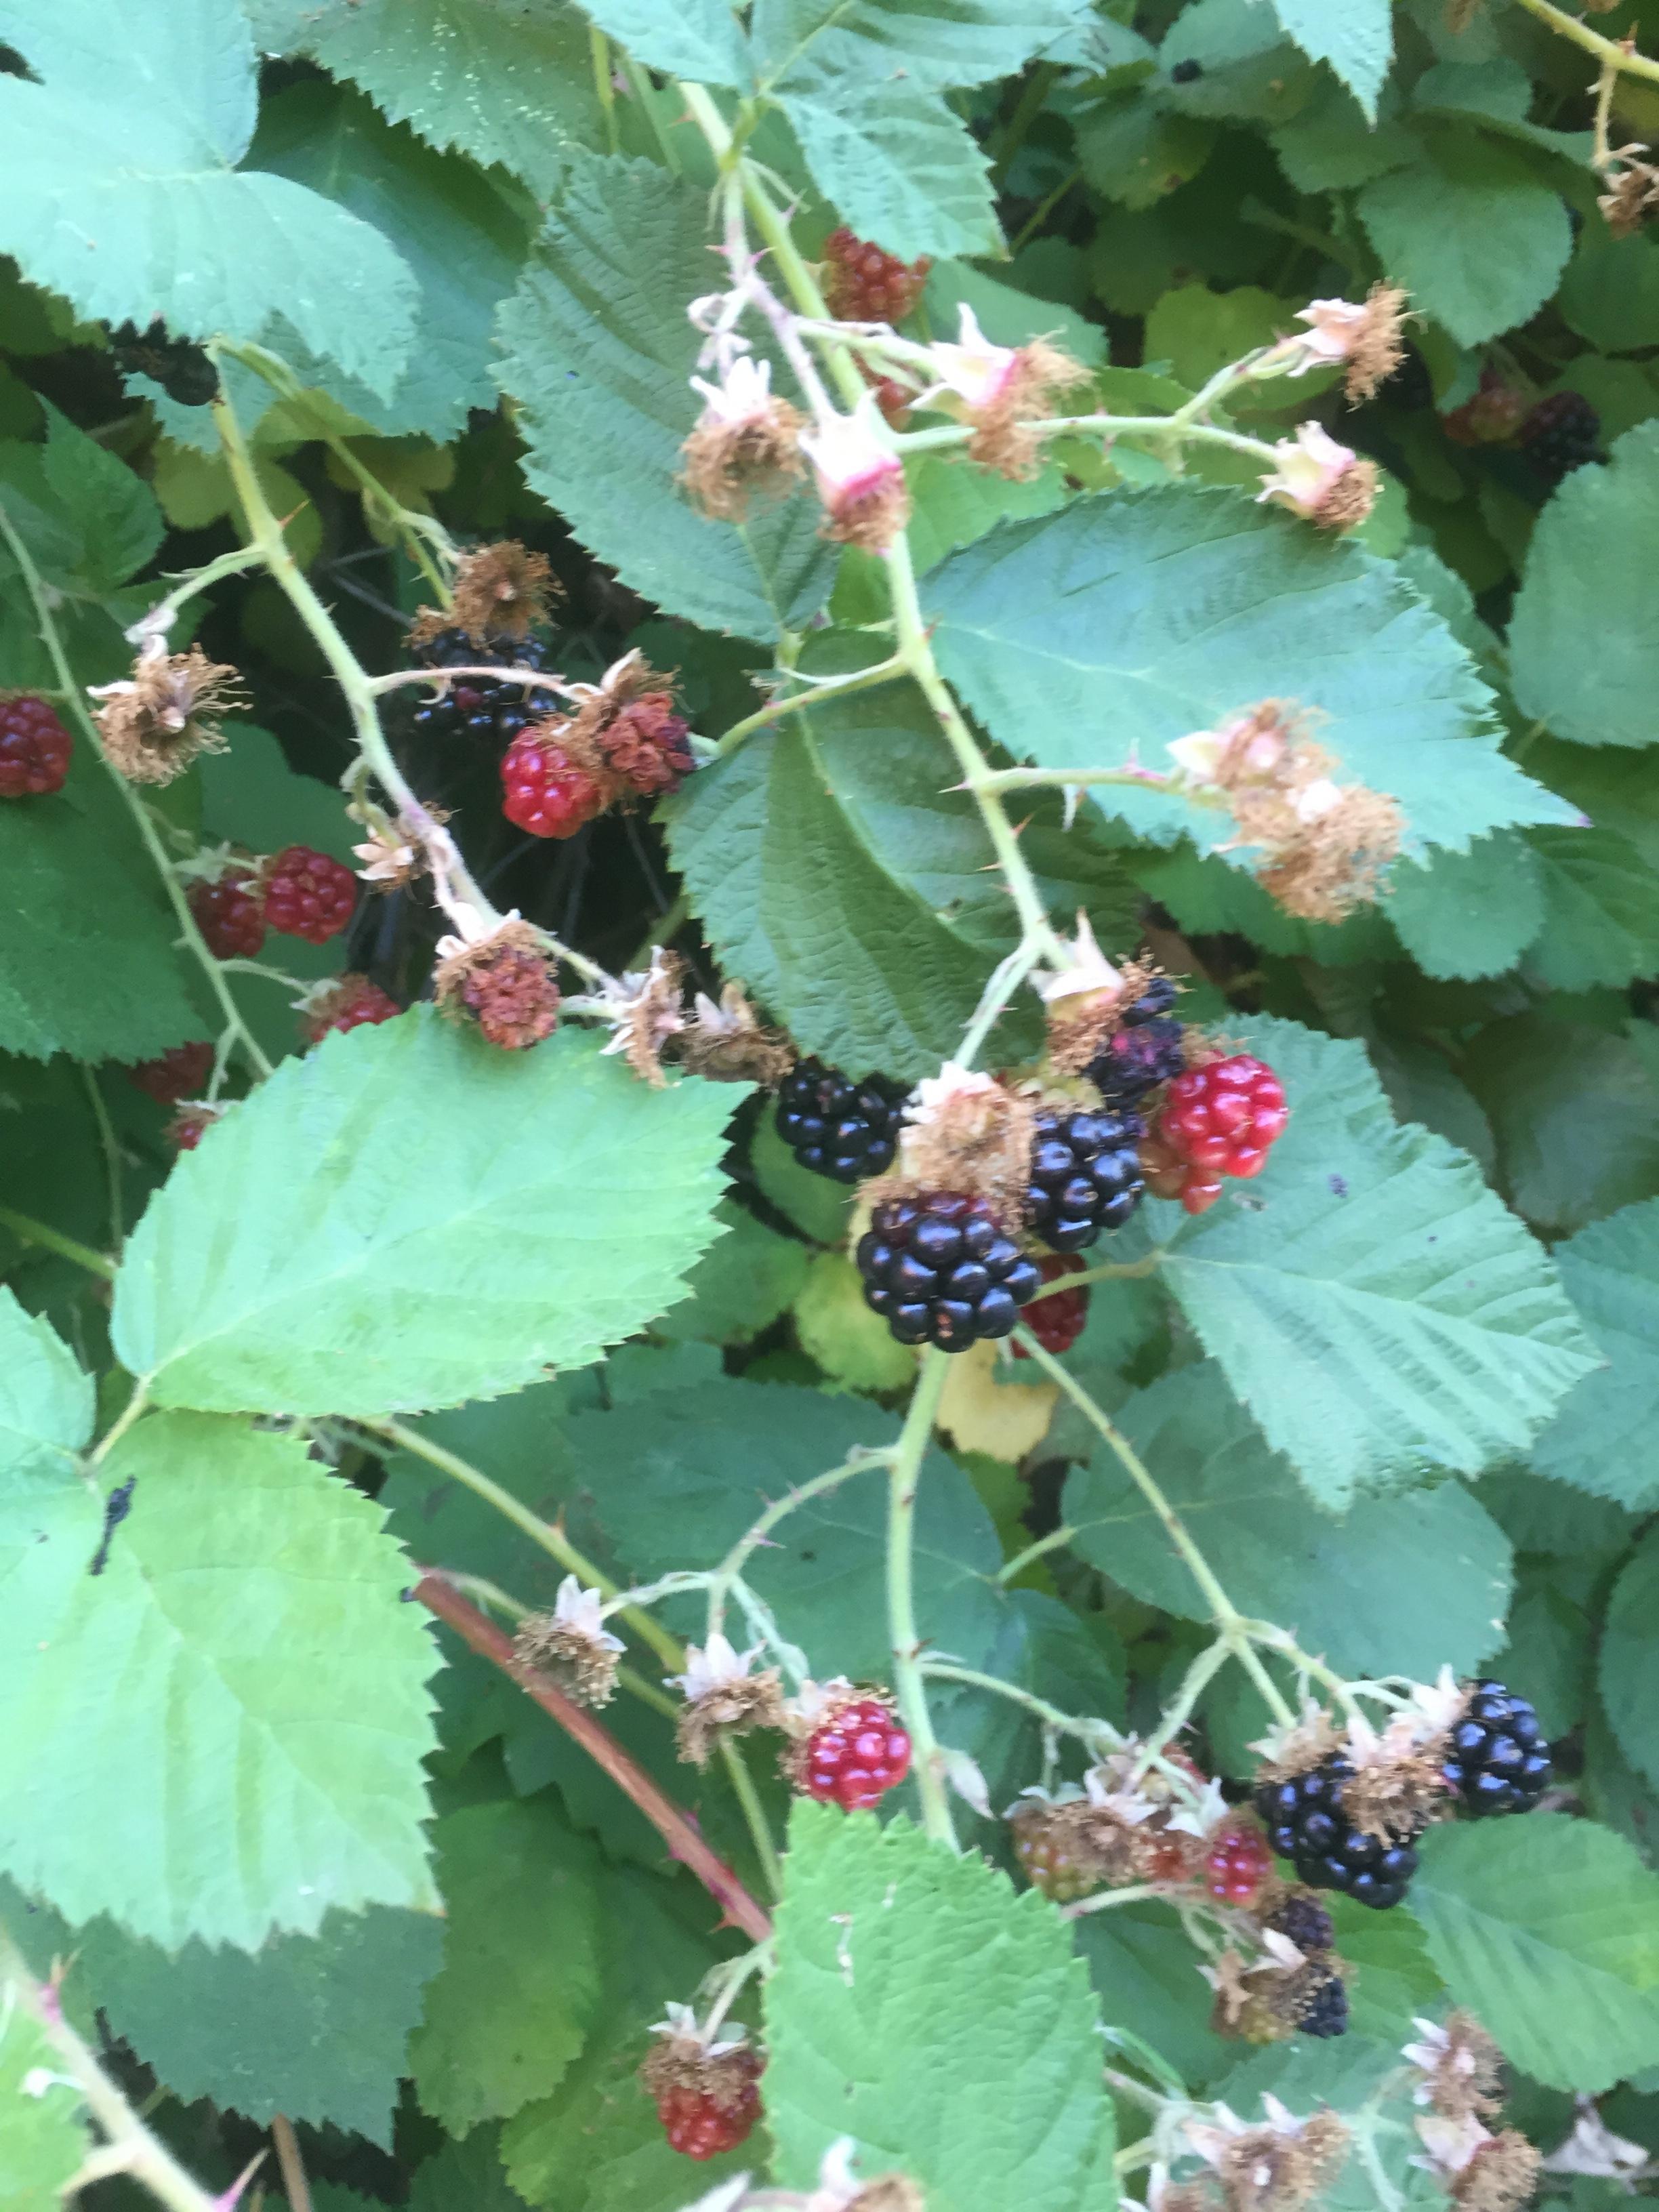 Yummy blackberries growing on trail